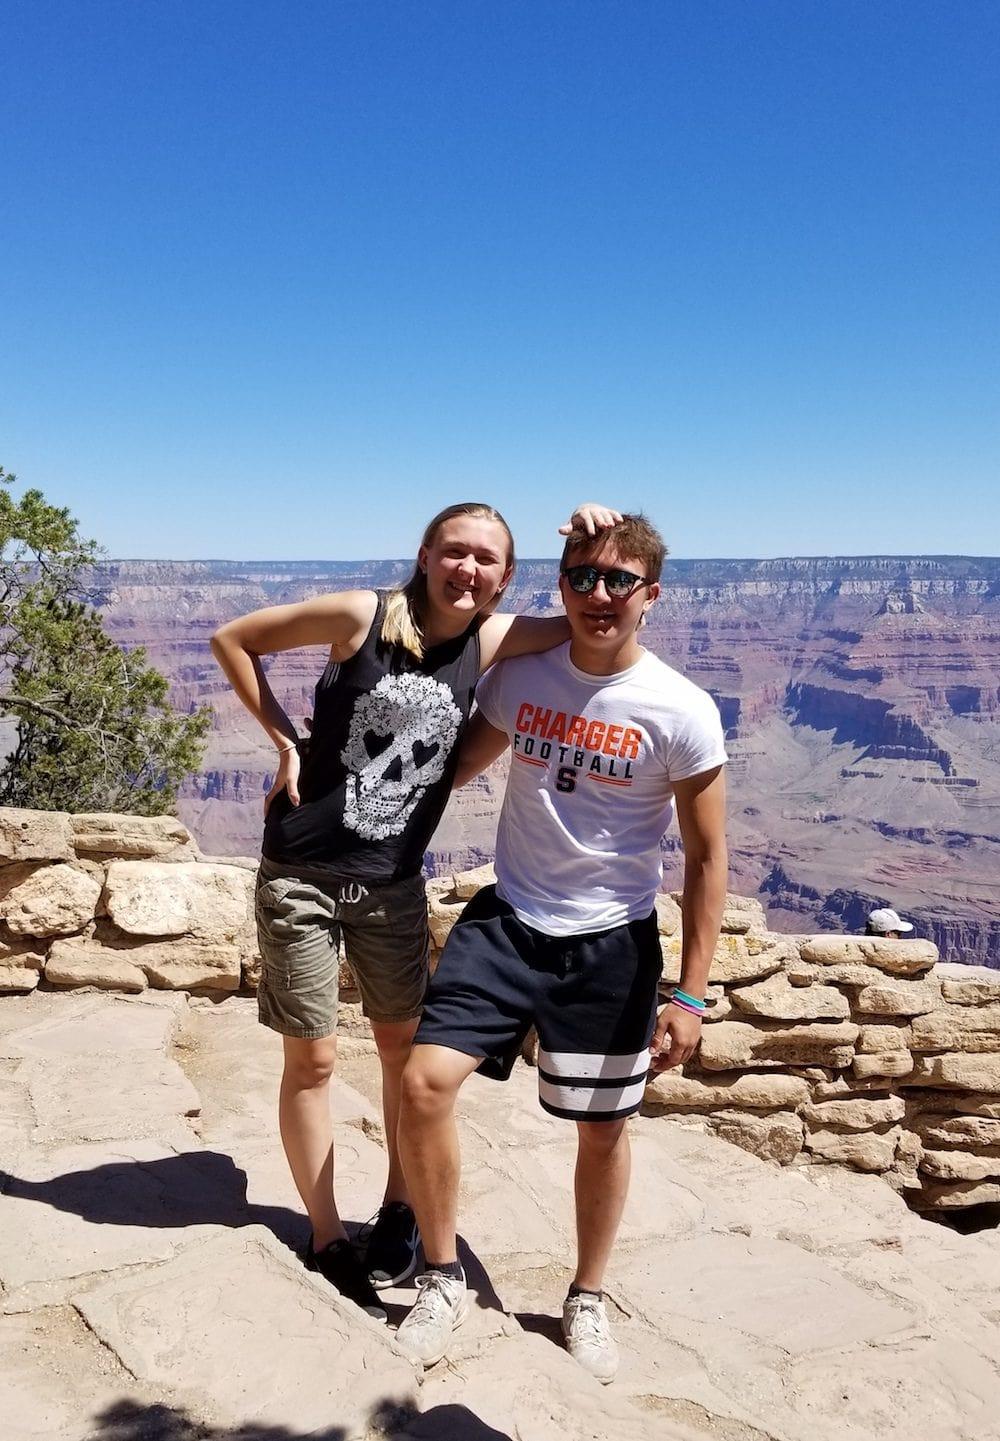 Chesney Gooding and Adam VanWitzenburg at the Grand Canyon